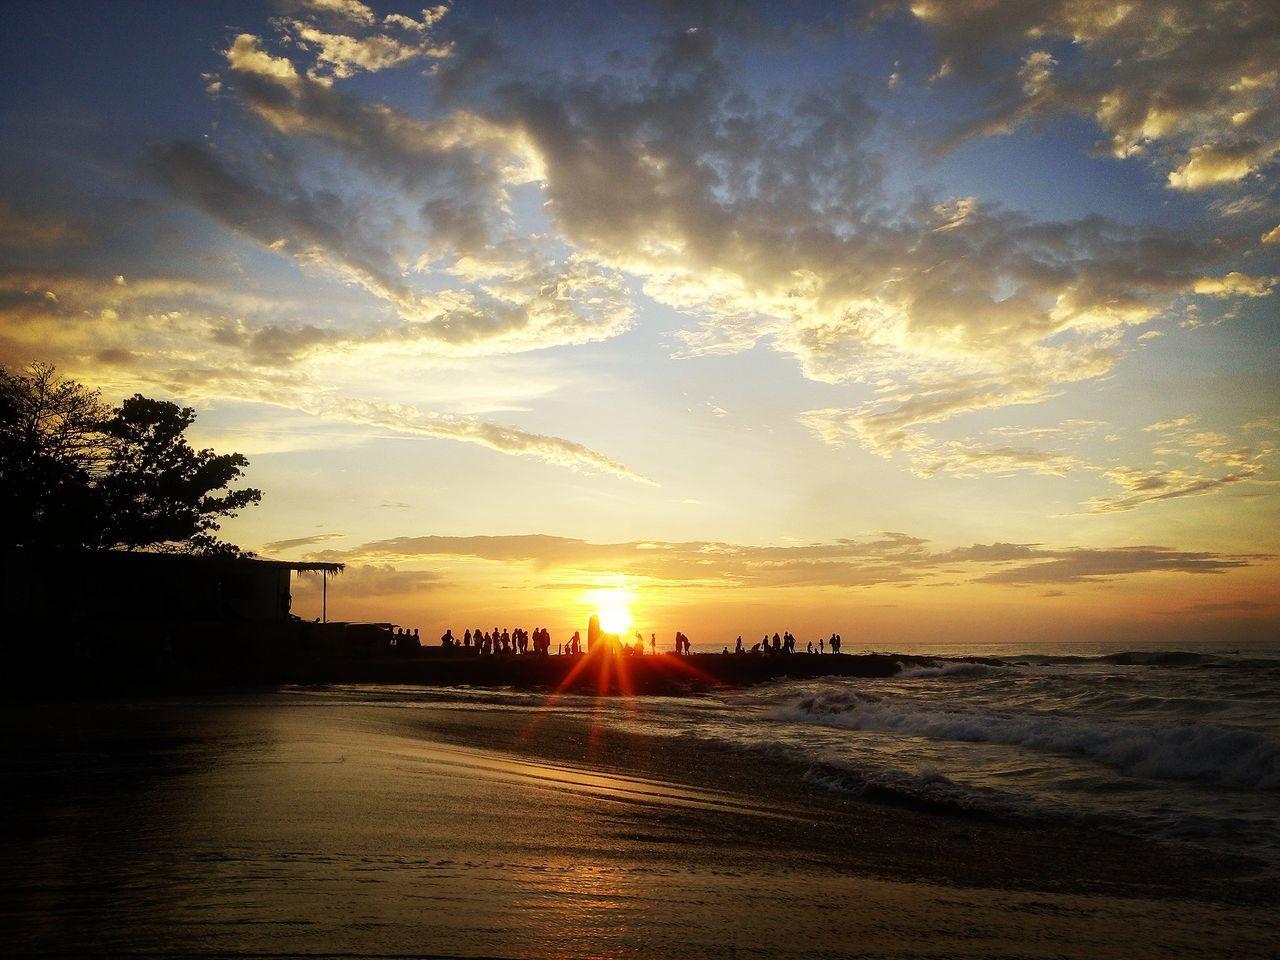 Beach Beachphotography Beach Photography Sanjuansurf Sanjuan Elyu Elyuclassic Launion Sunset Sunset_universe Sunset_pics Sunset Colors Sunset View. Sunset Lovers Sunsetphotographs Sunset_madness Sunset_captures Sunsetporn Sunsetlover Sunset Silhouettes Sunset_collection